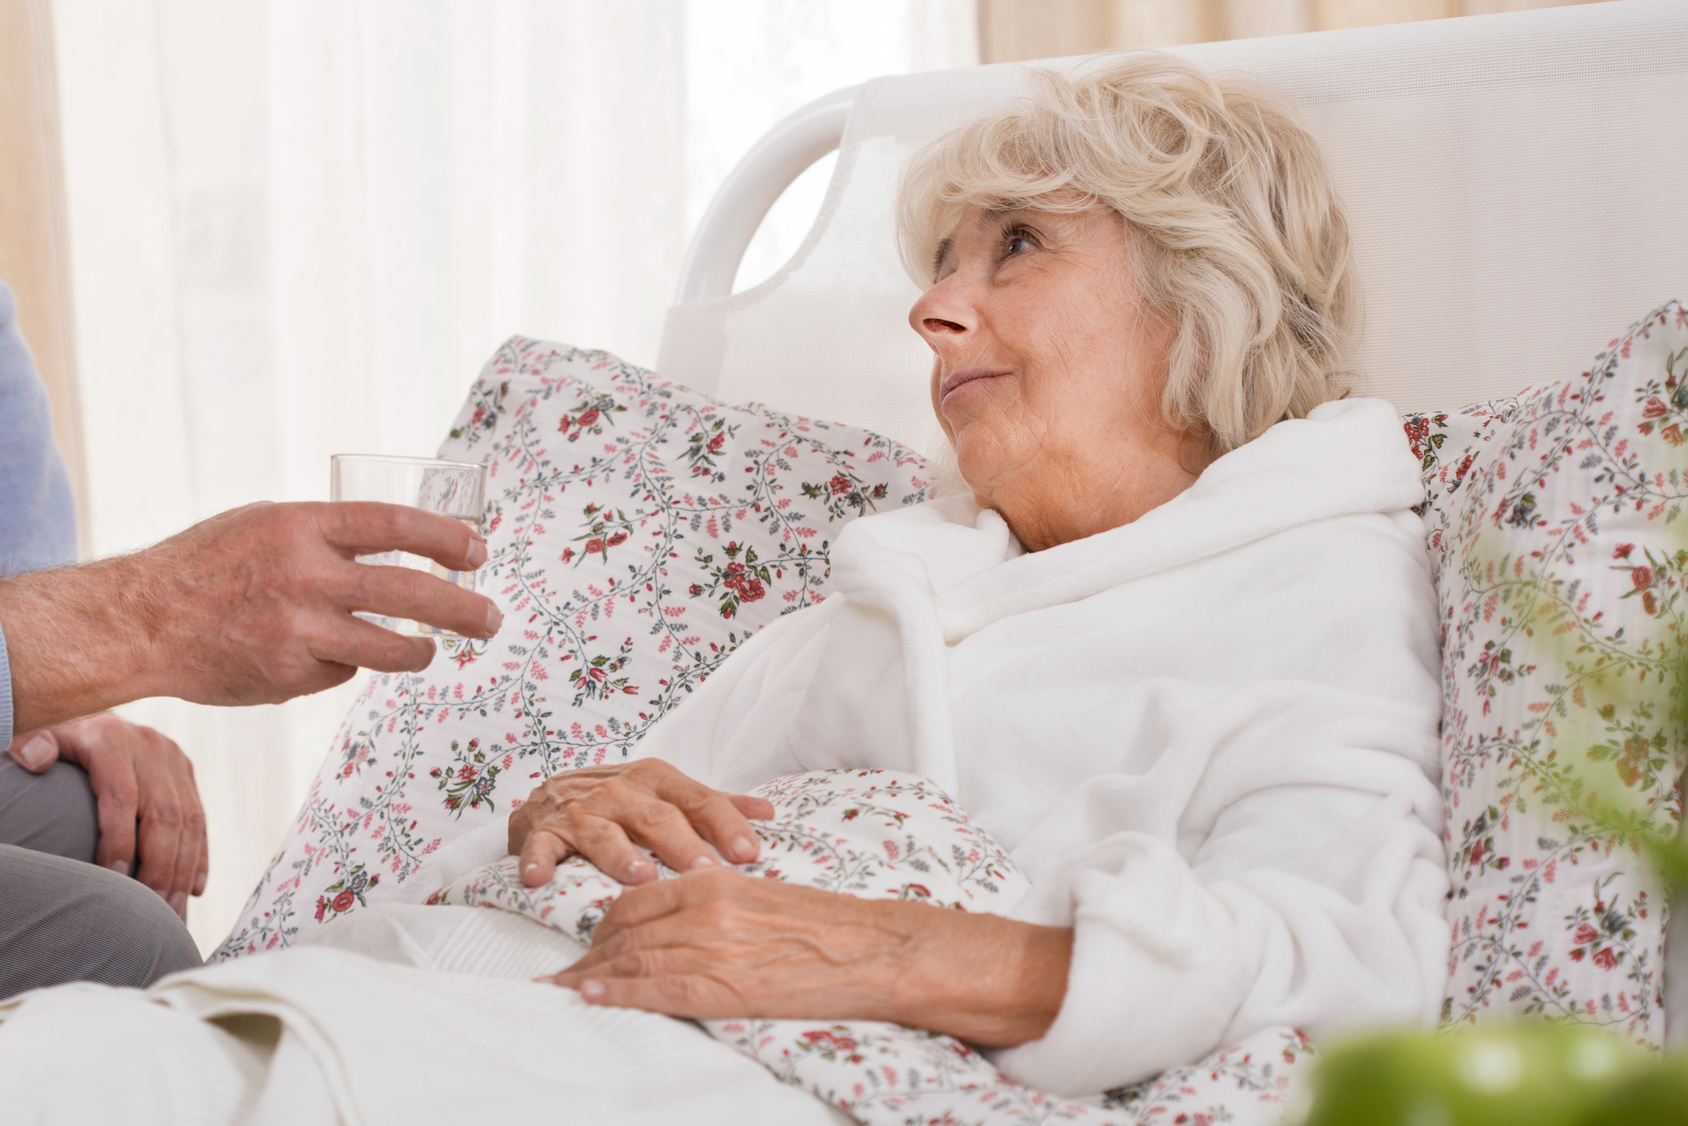 Seniorin mit Parkinson im Bett